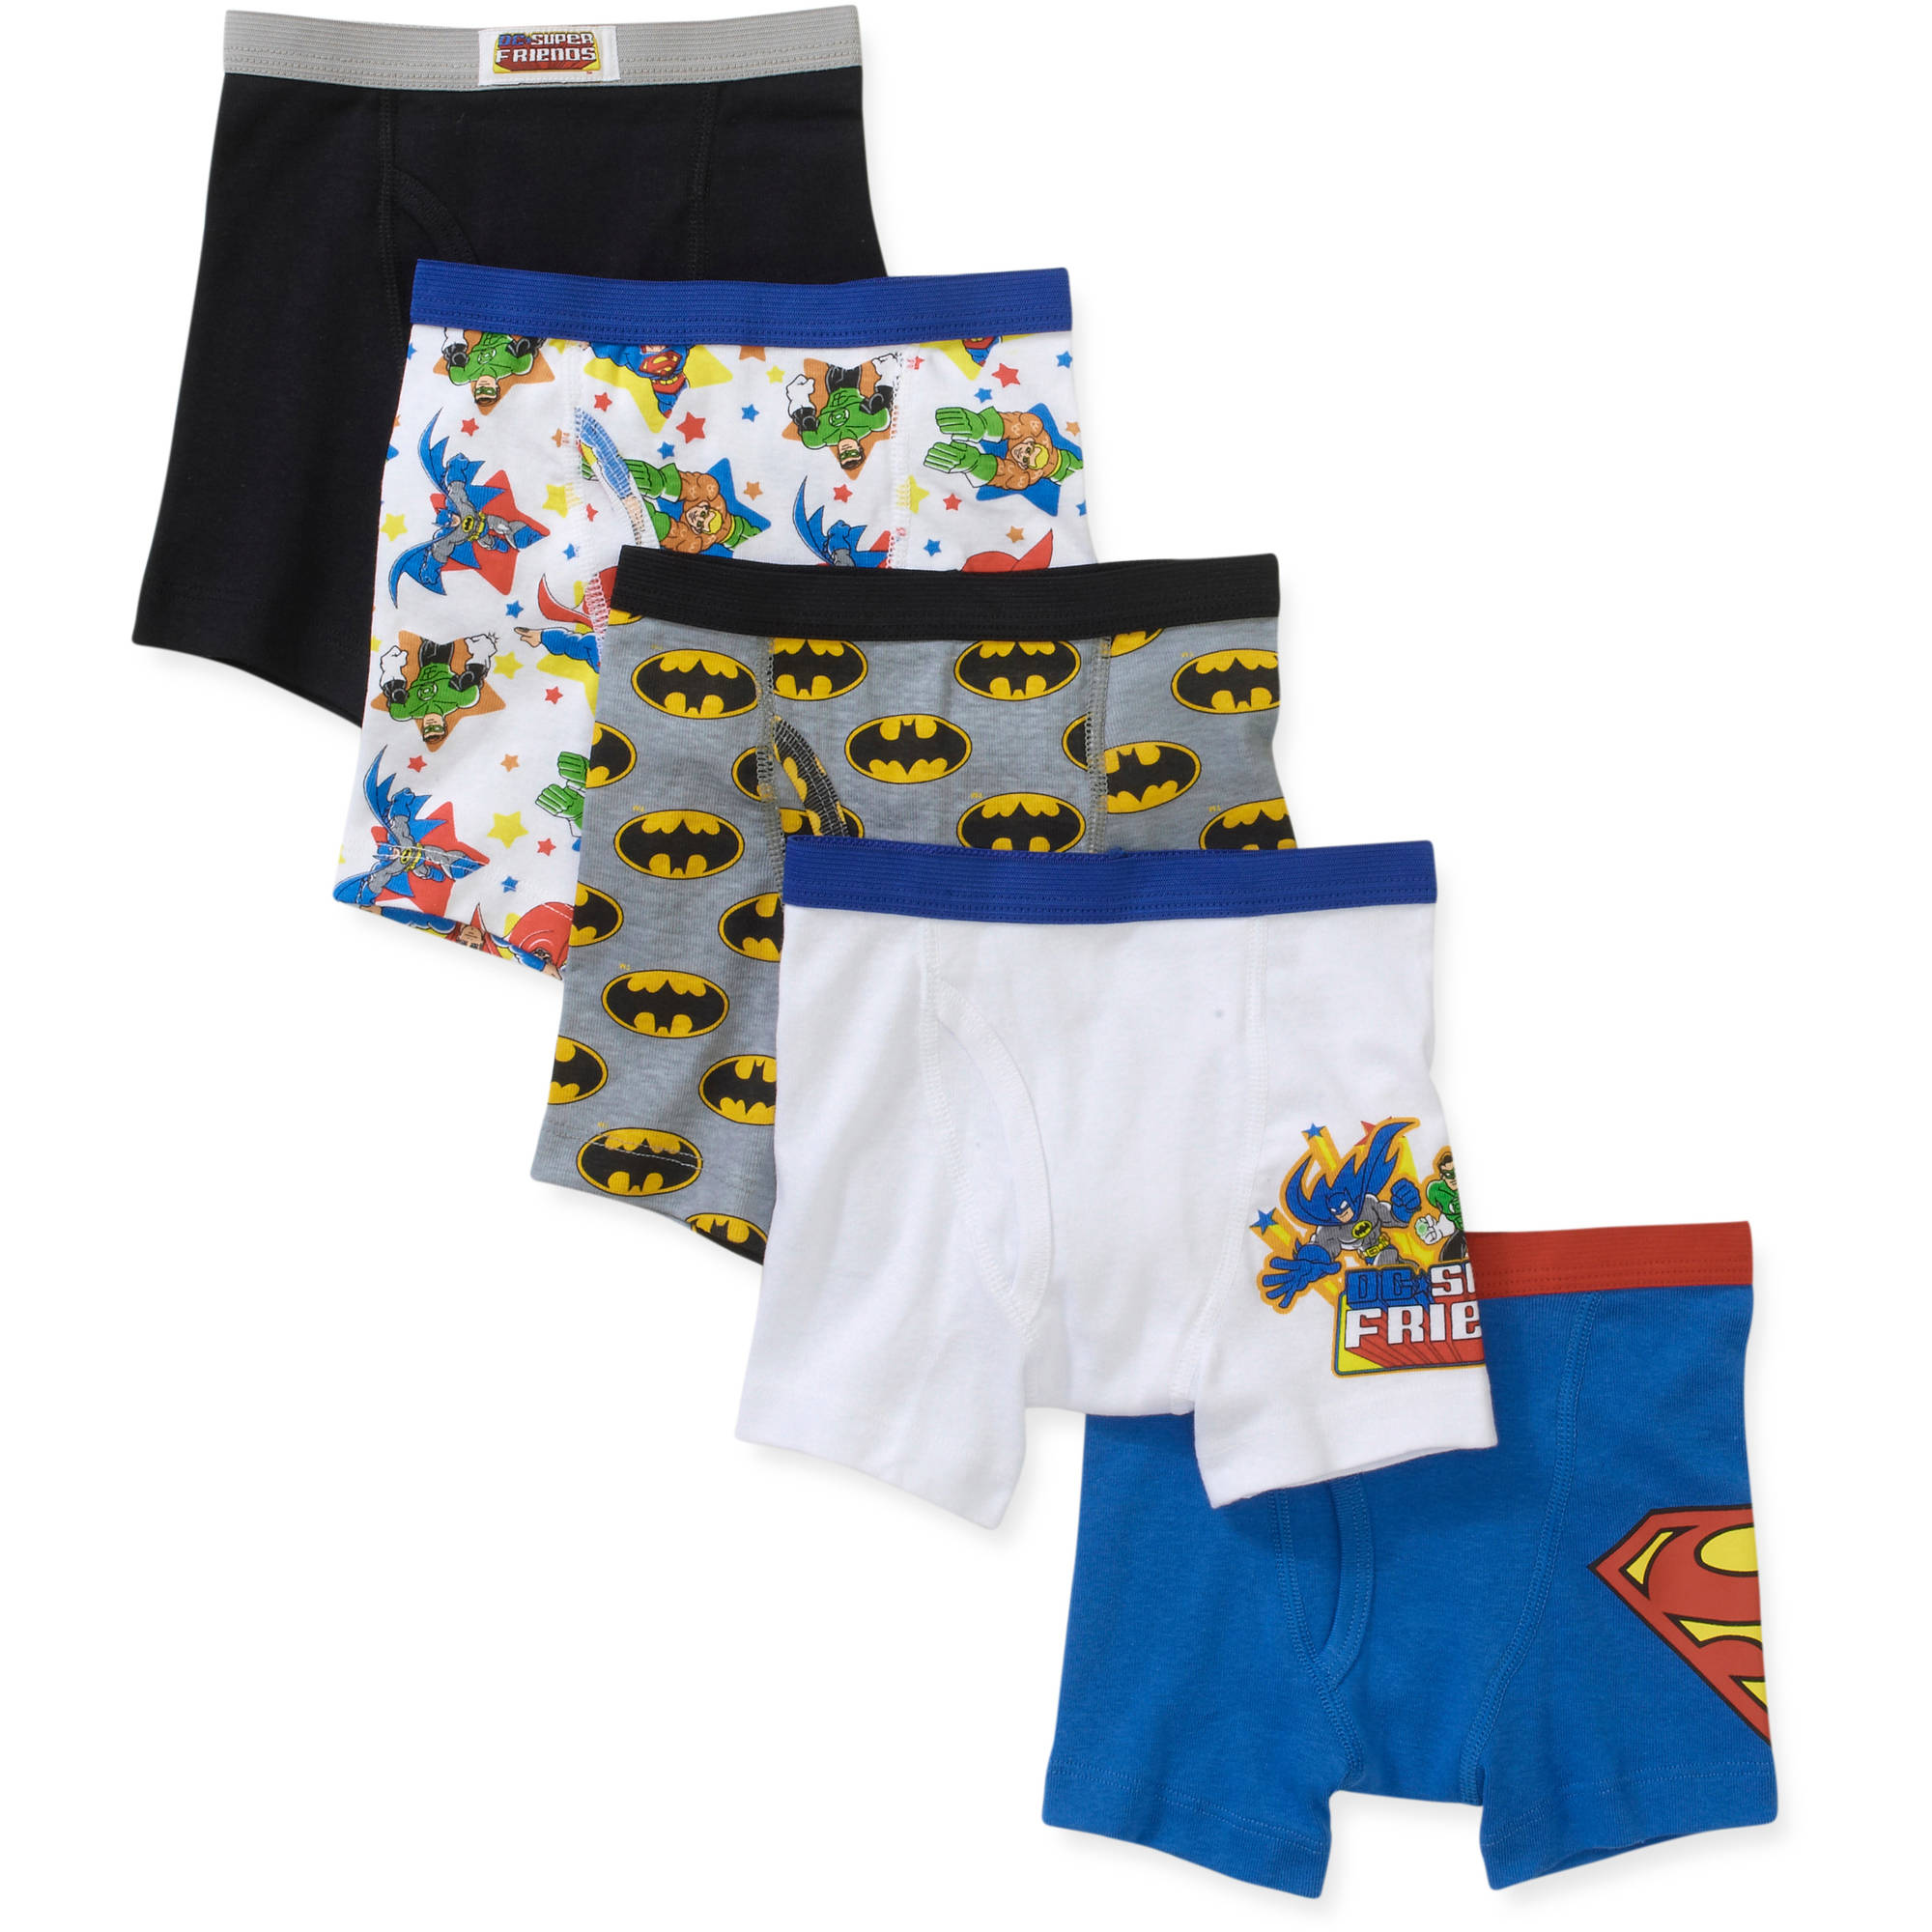 Super Friends Toddler Boys Boxer Briefs, 5 Pack